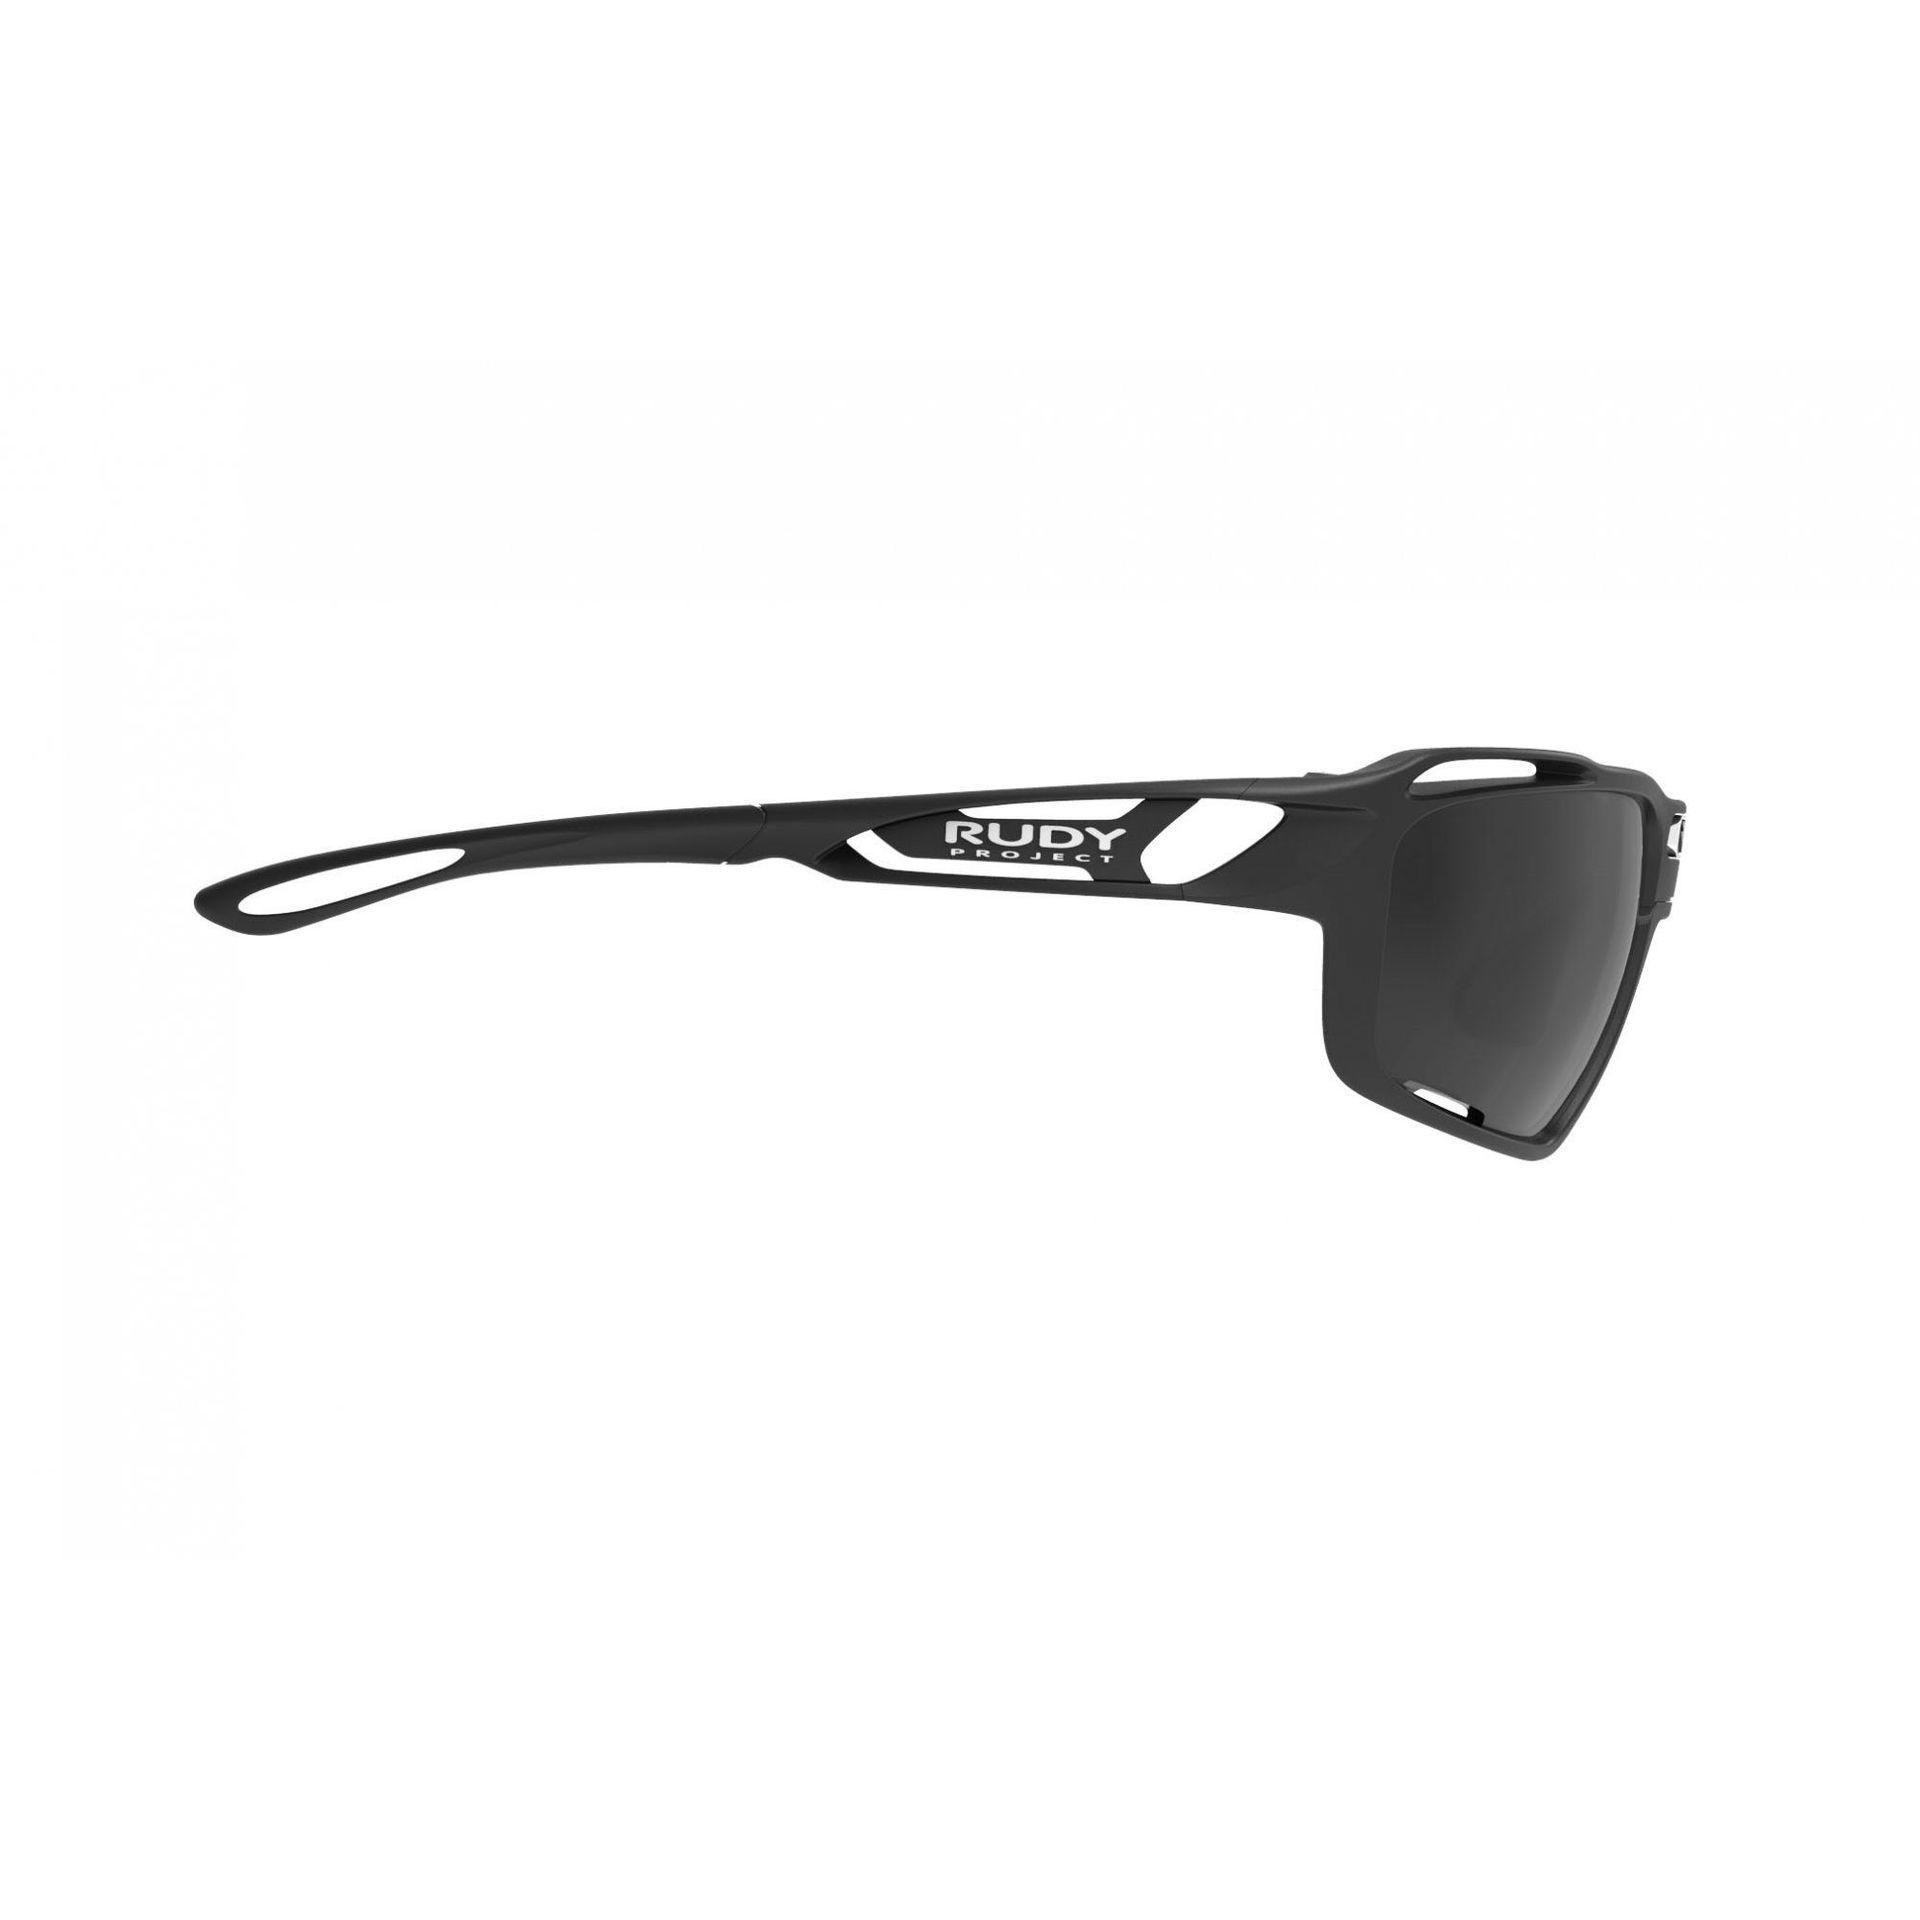 OKULARY RUDY PROJECT SINTRYX BLACK + SMOKE TRANS SP491006 4